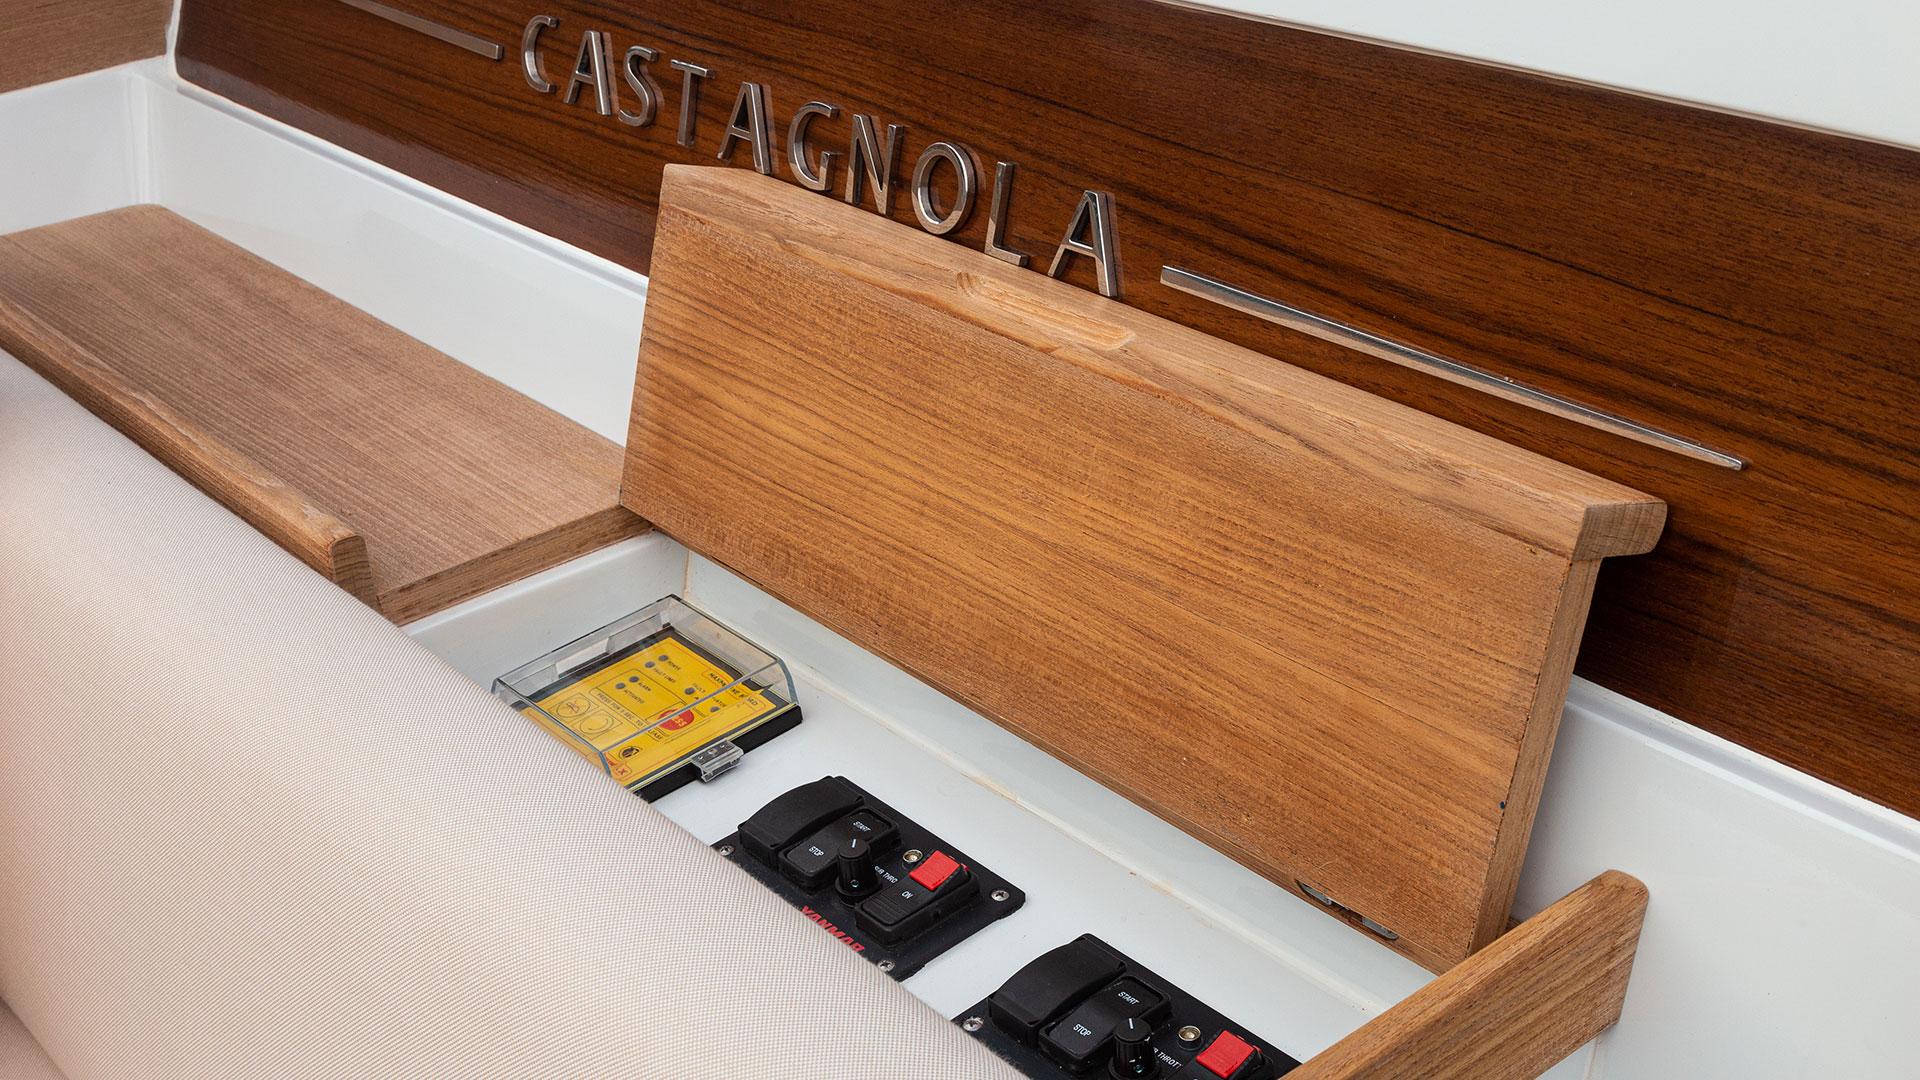 castagnola-heritage-9-9